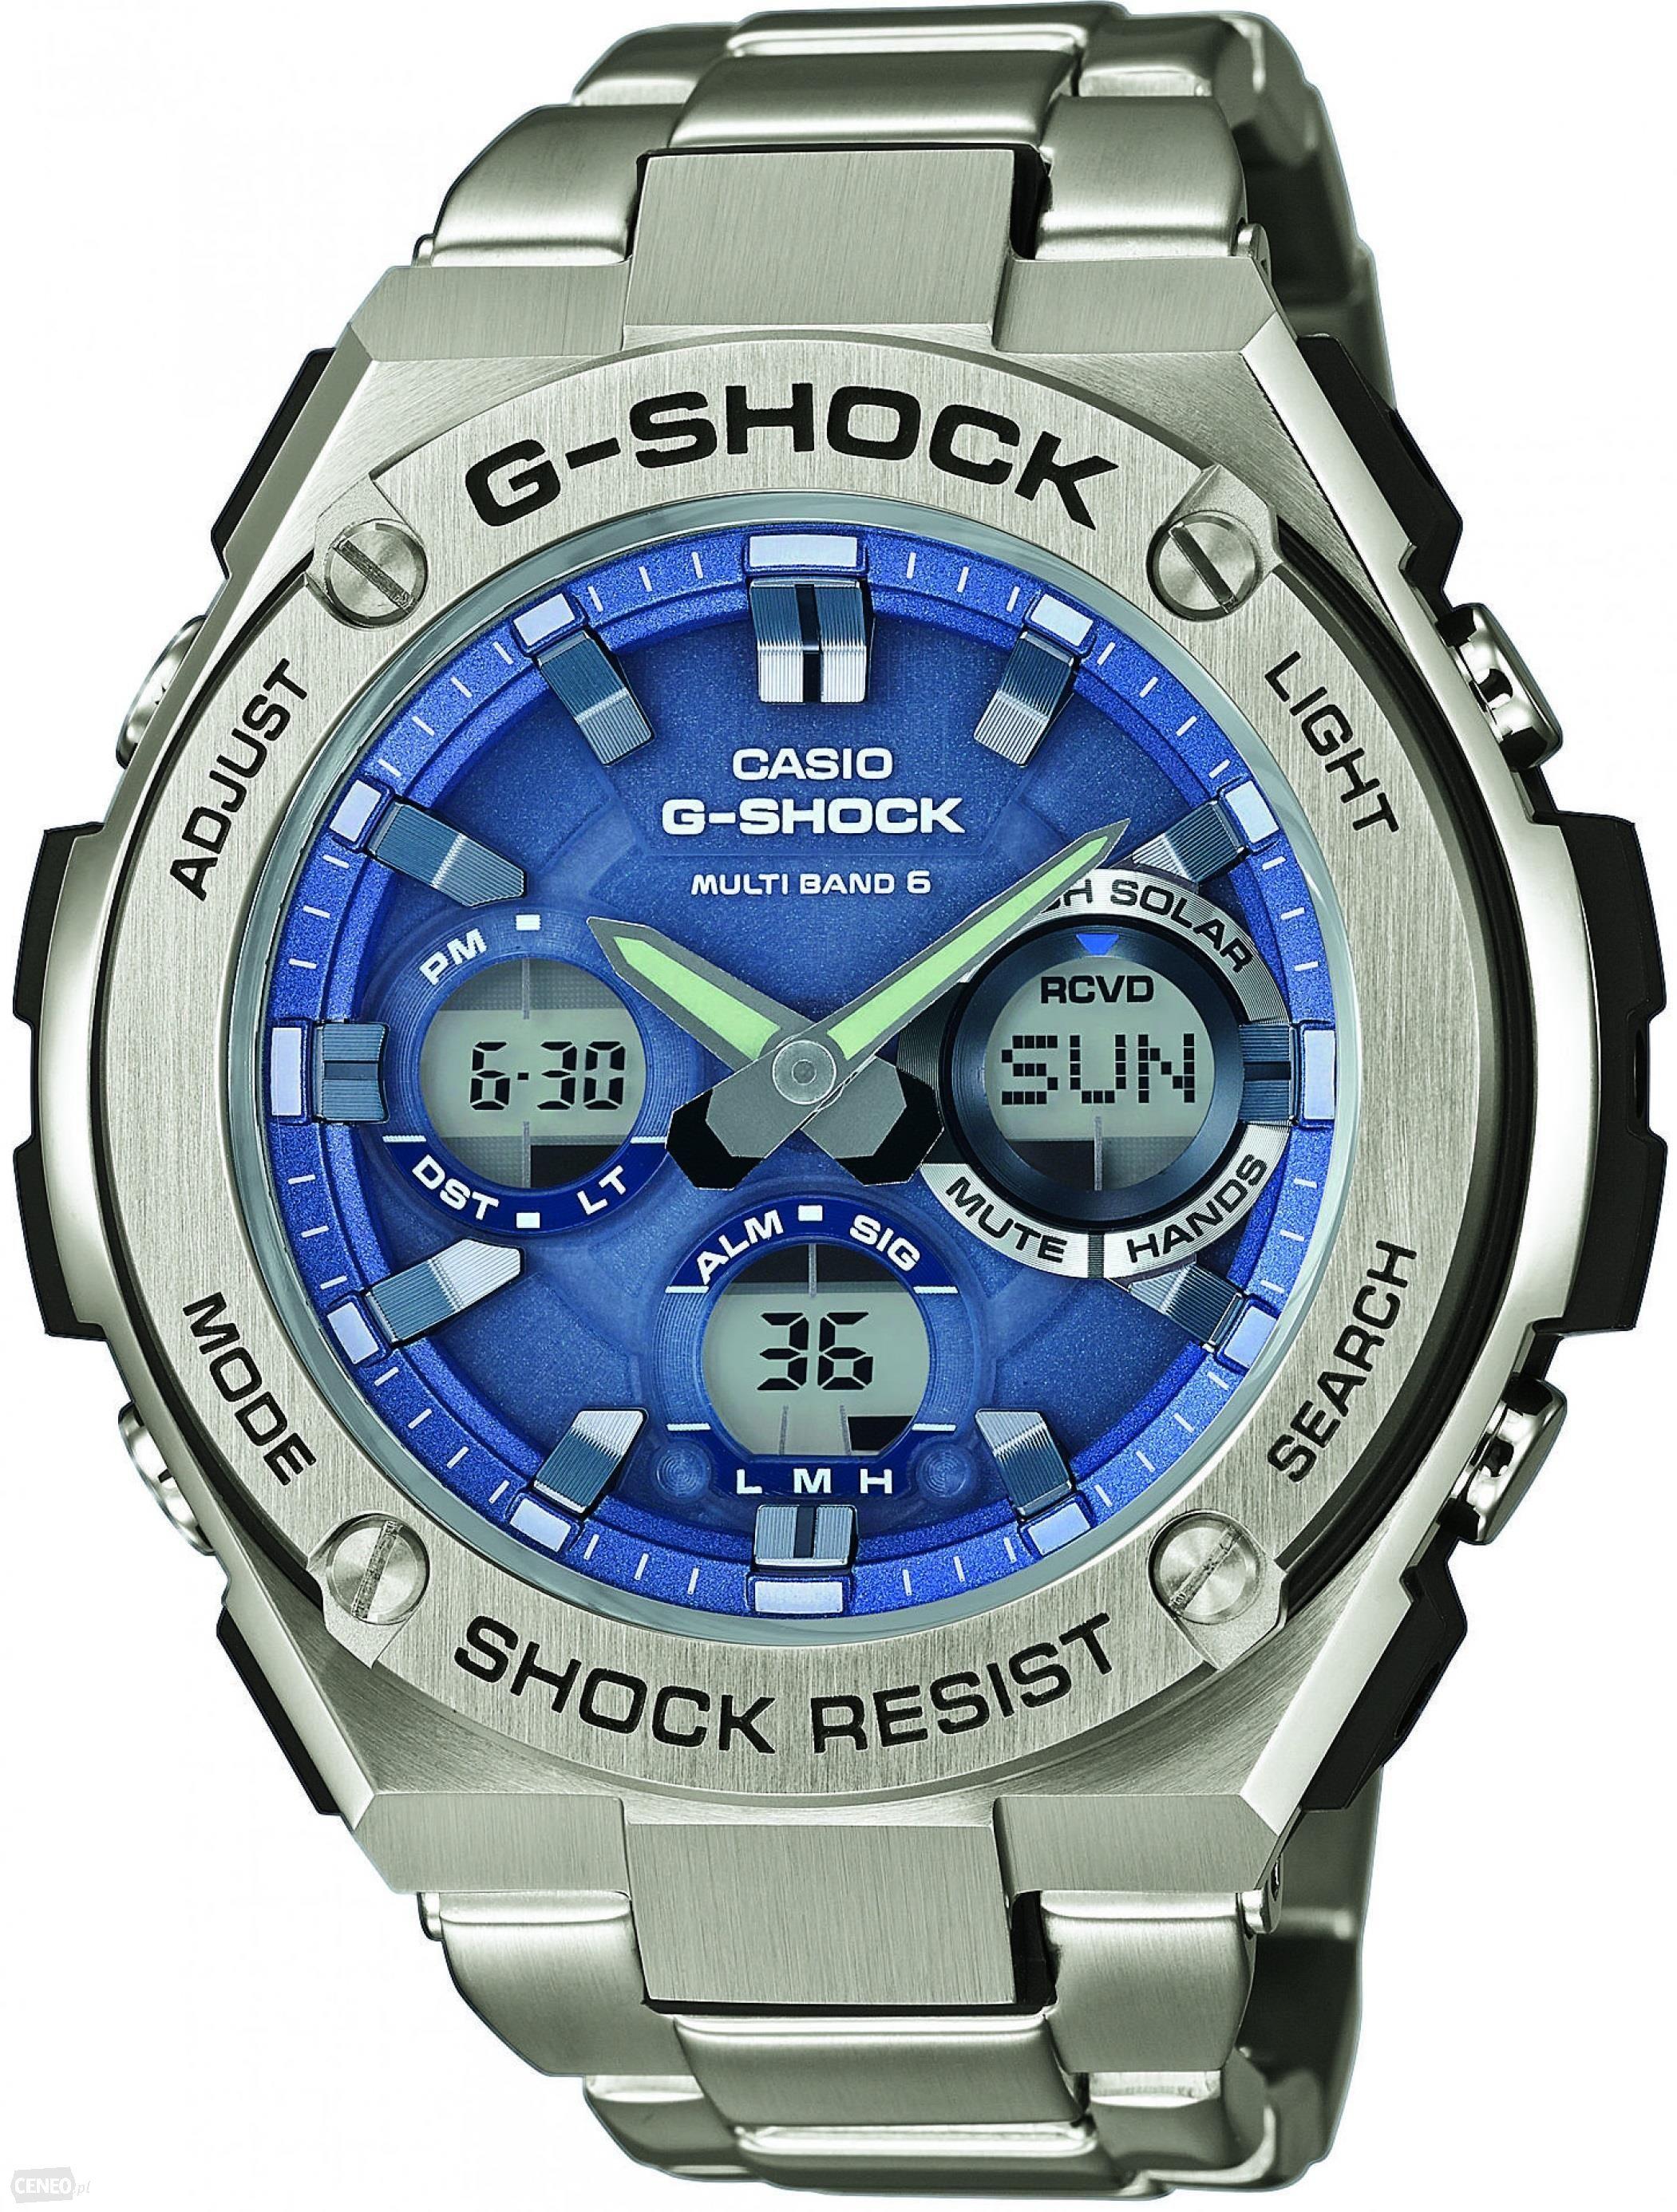 CASIO G-SHOCK G-STEEL SOLAR GST-W110D-2AER